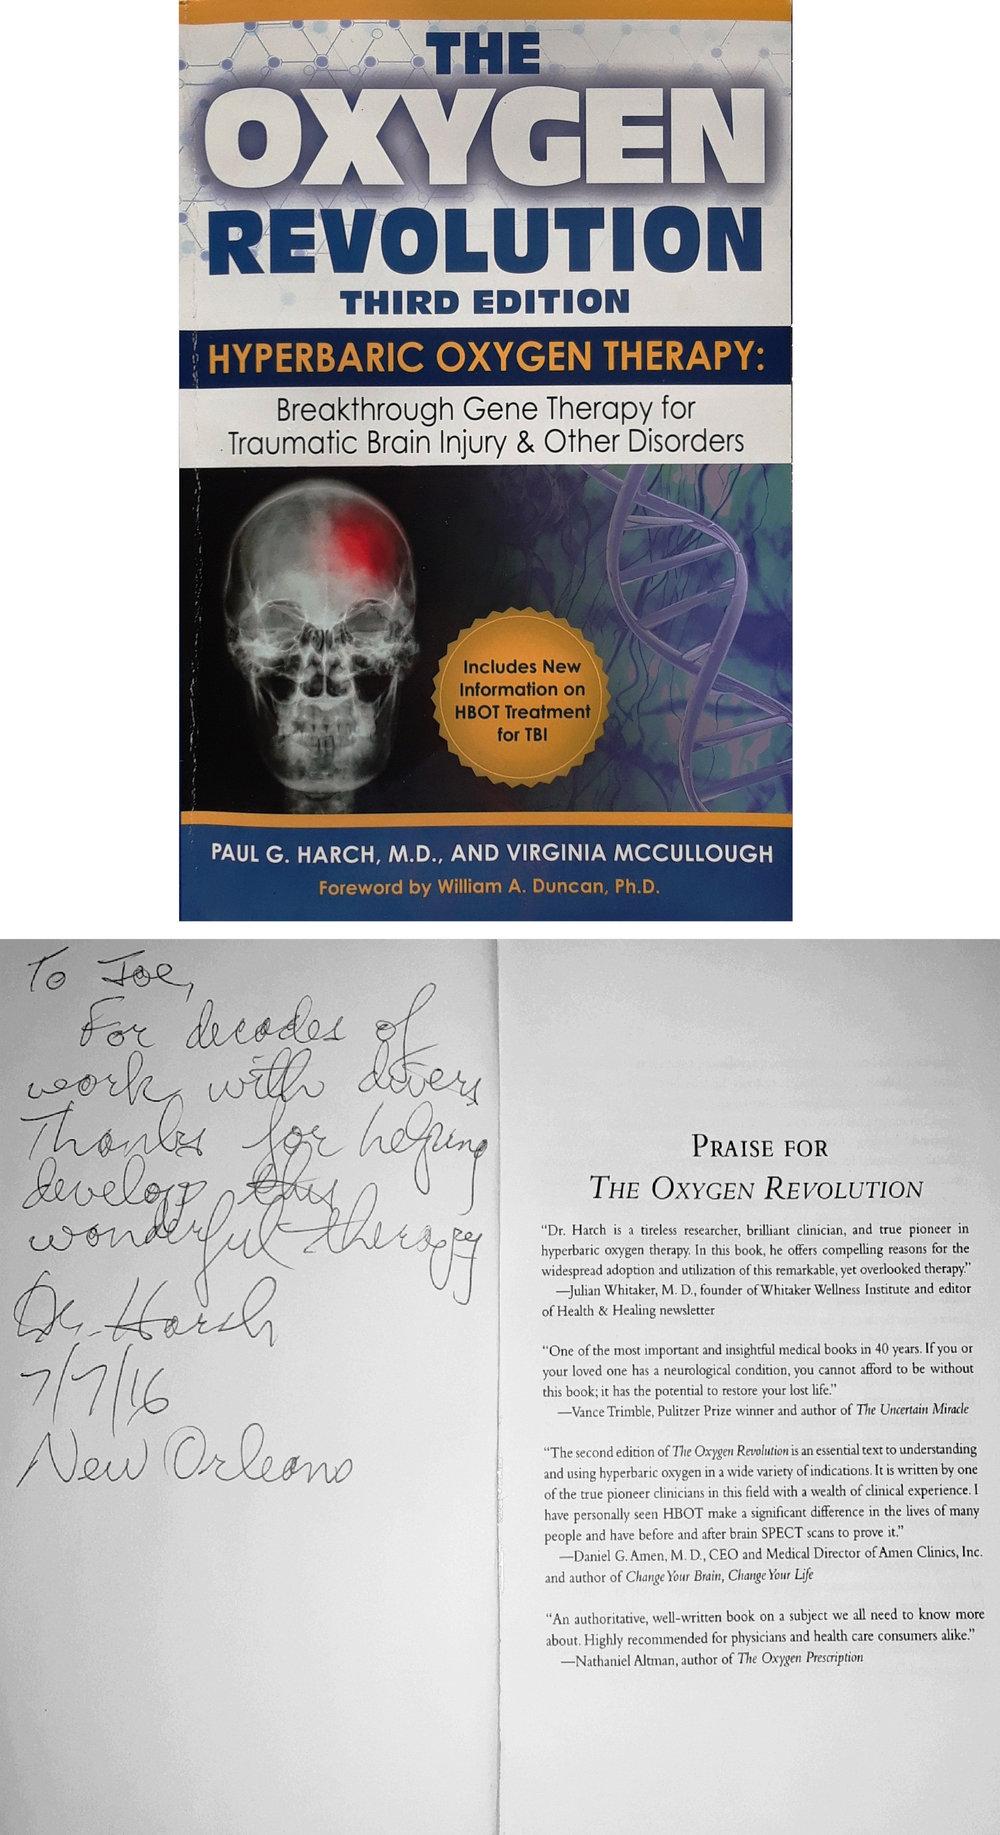 Oxygen Revolution - Cover & Harch Inscription.jpg